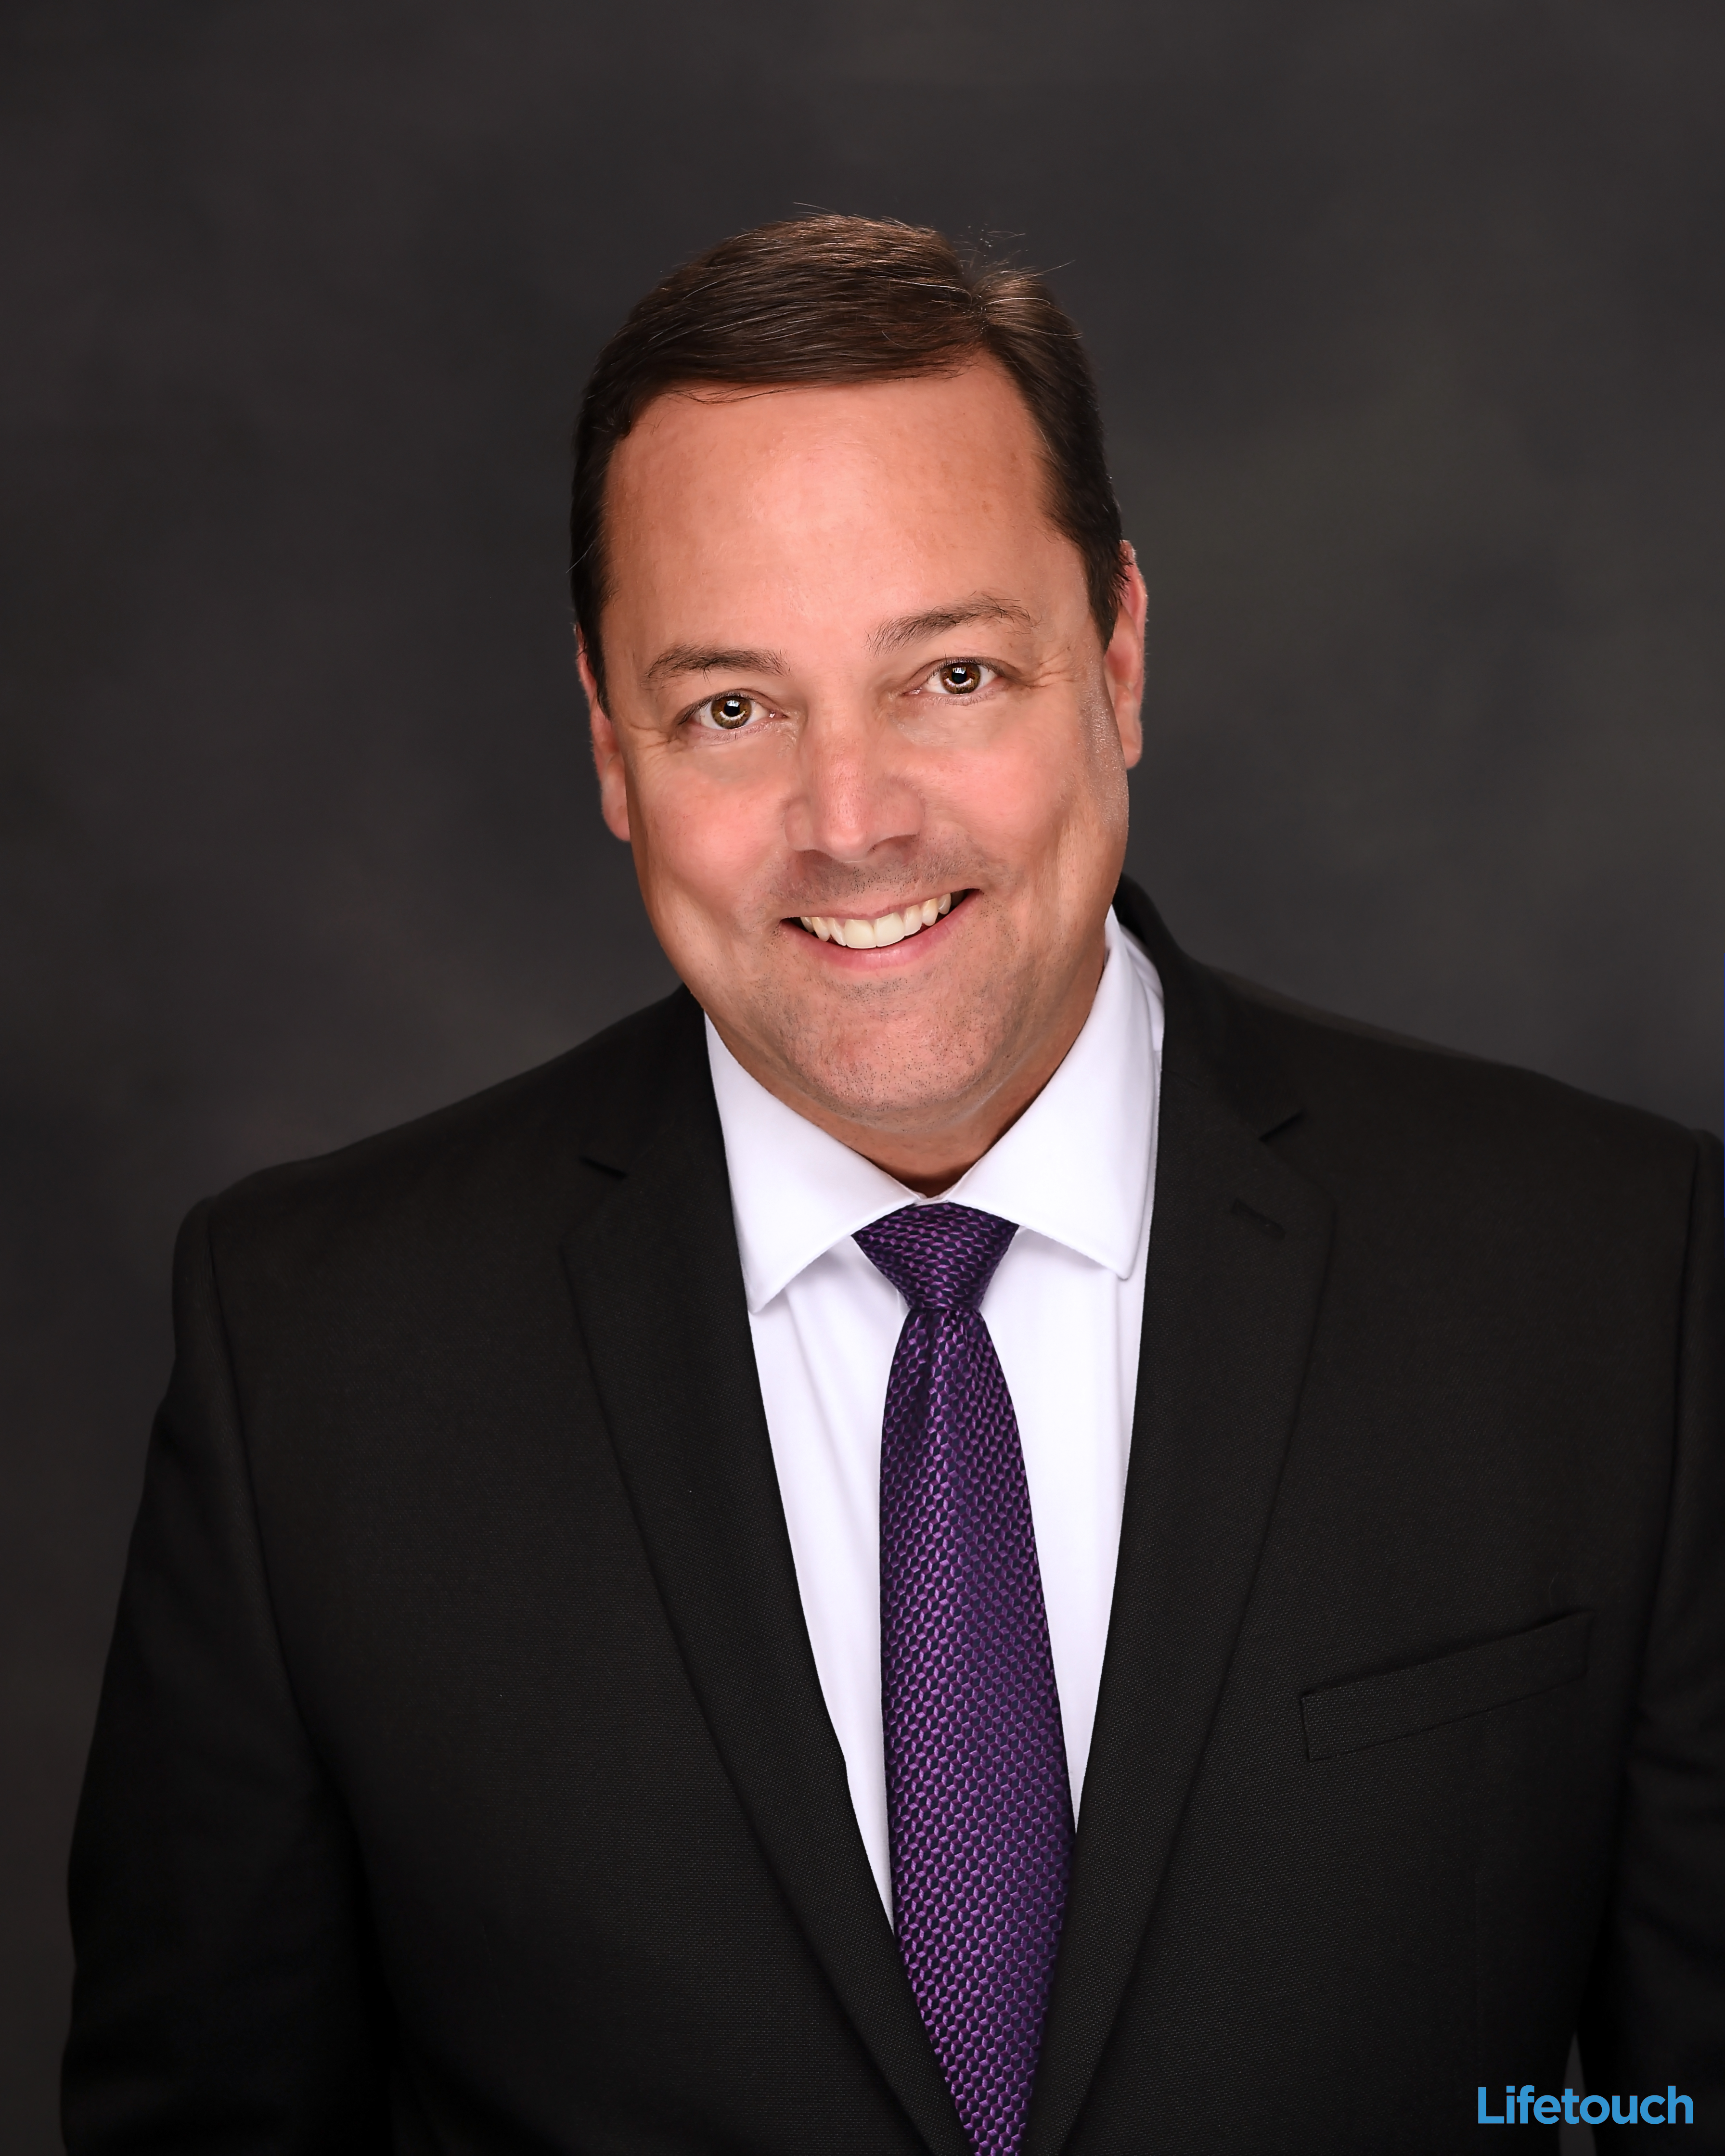 Dr. Craig S. Pinello